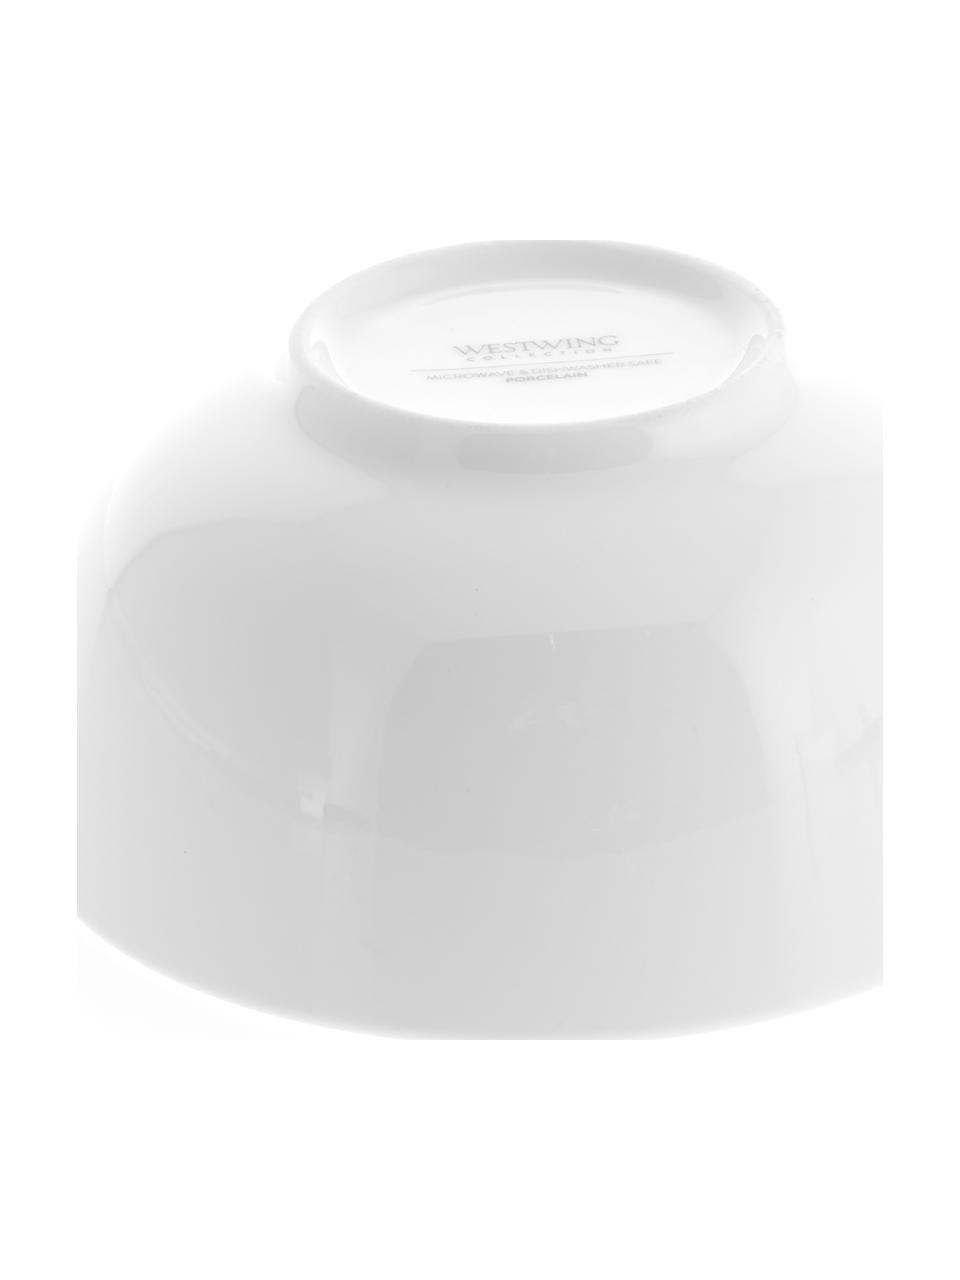 Ciotola in porcellana Delight 2 pz, Porcellana, Bianco, Ø 14 x Alt. 7 cm